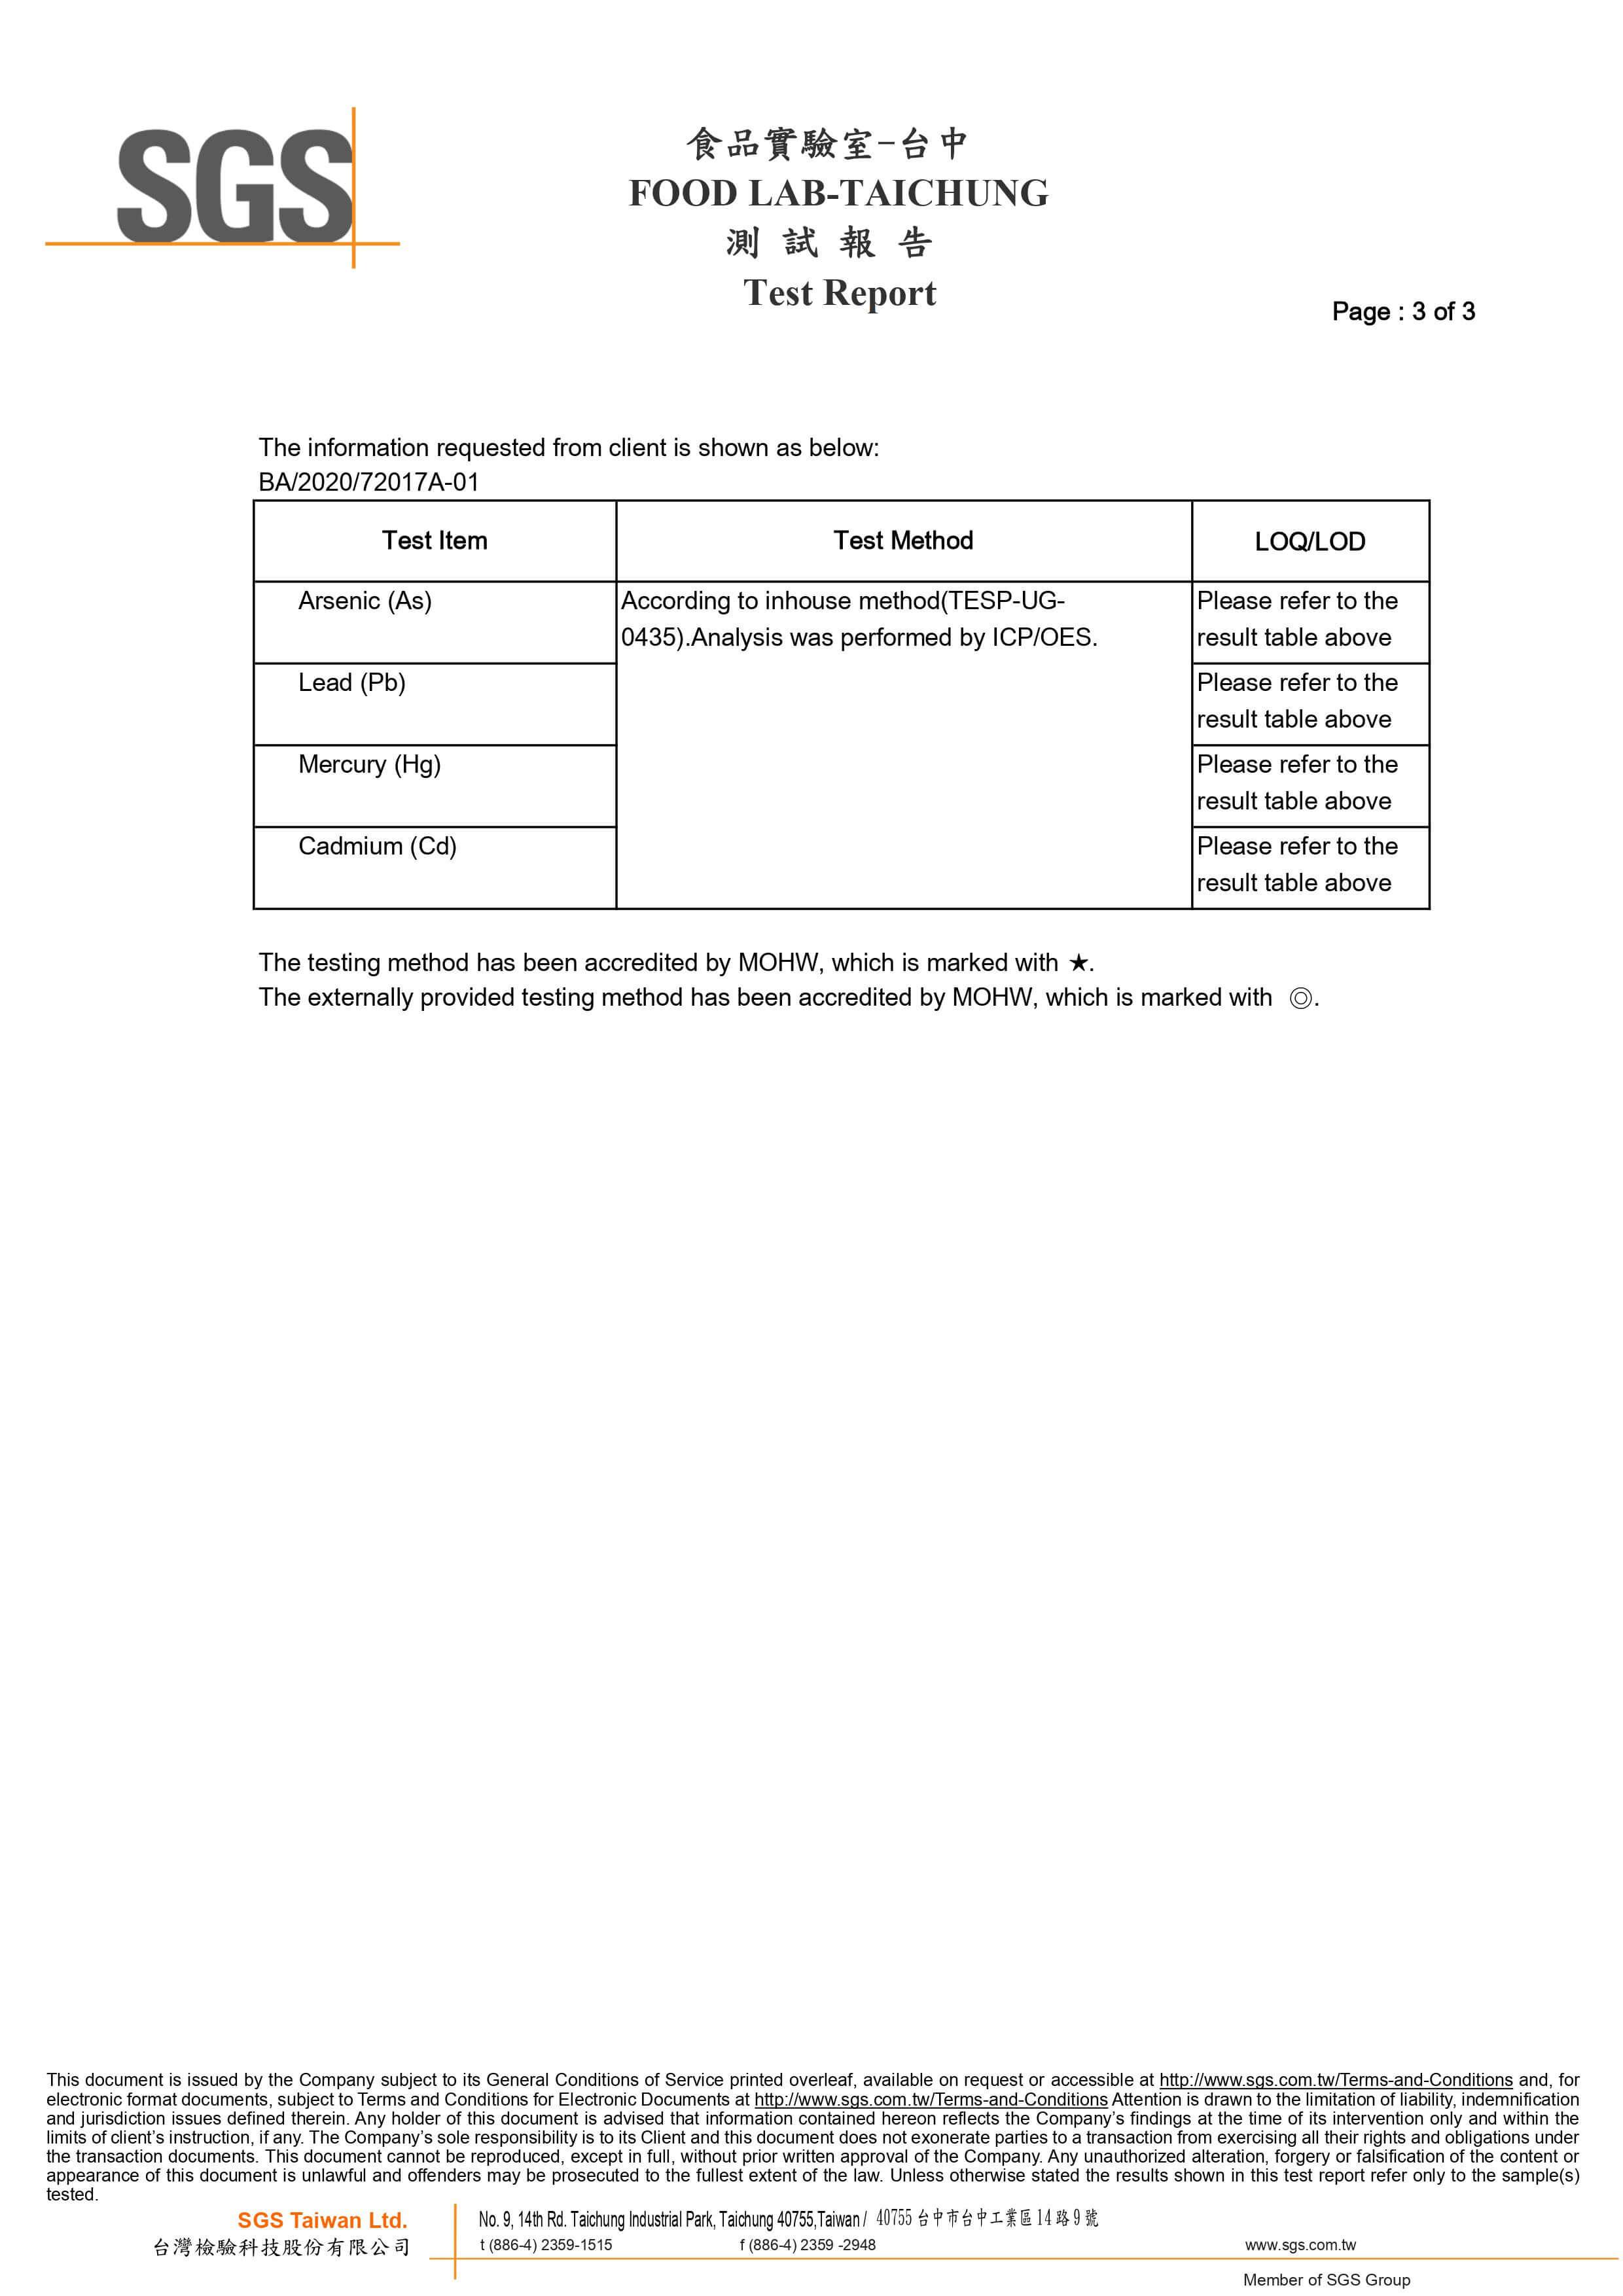 SGS Test Report No.1 p3-3